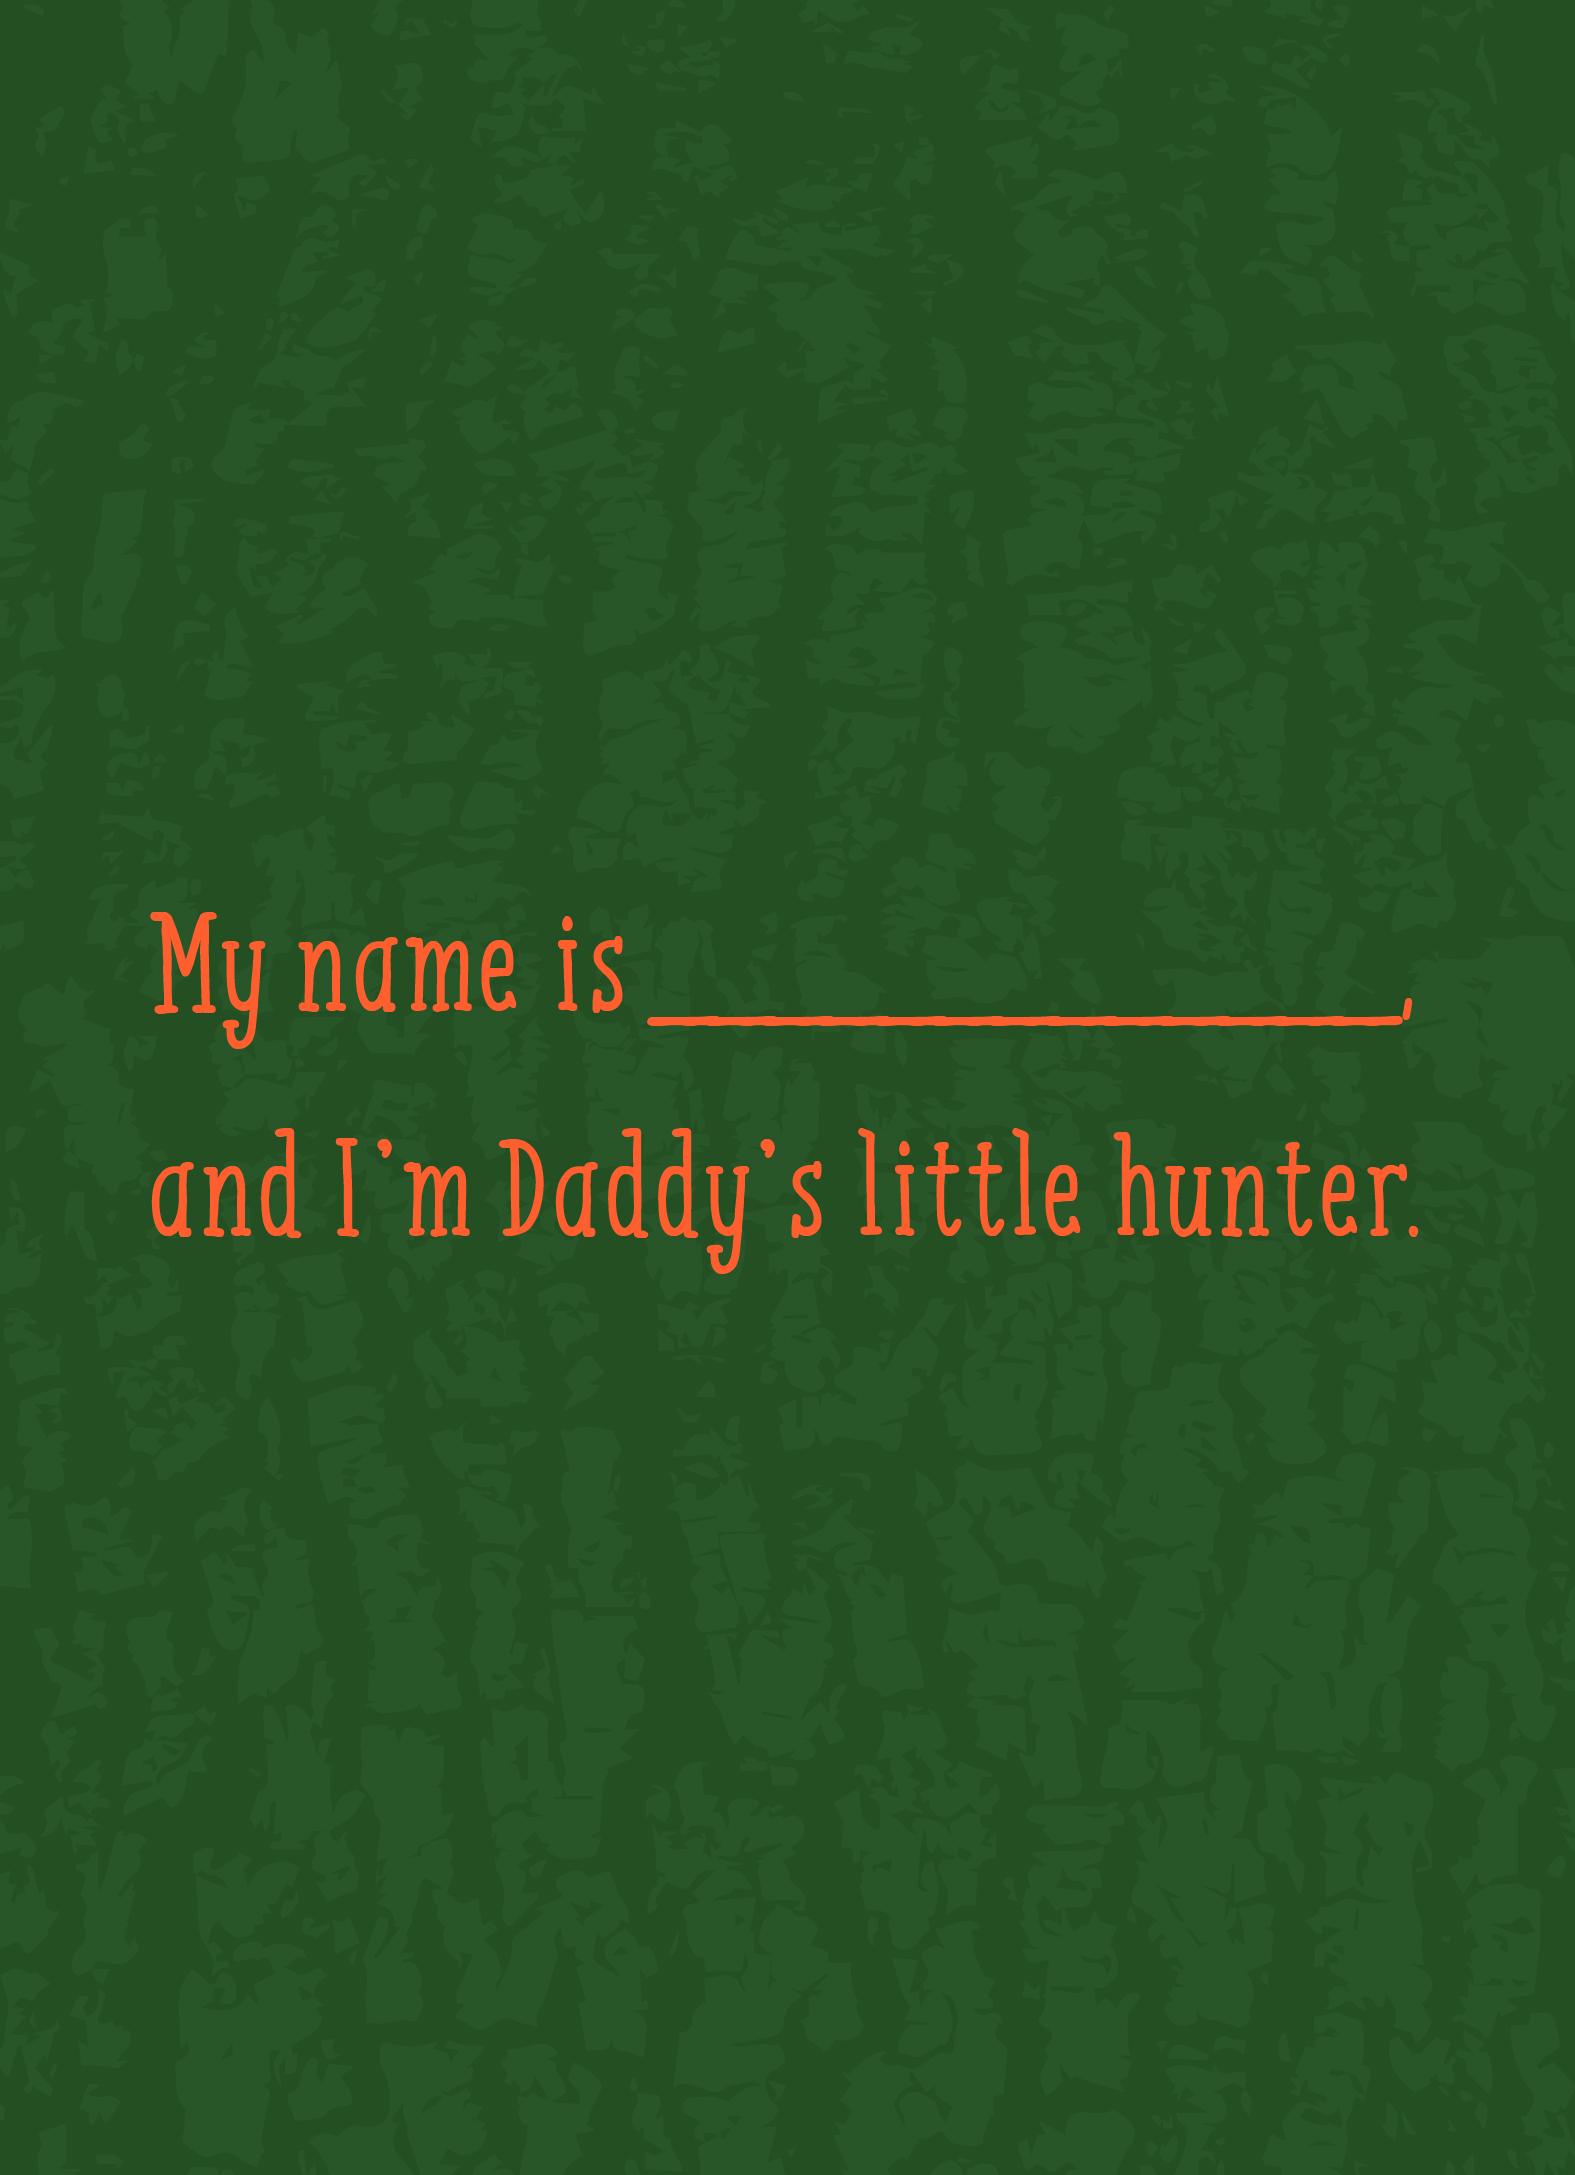 Daddy's Little Hunter-CMYK_Page 2.jpg